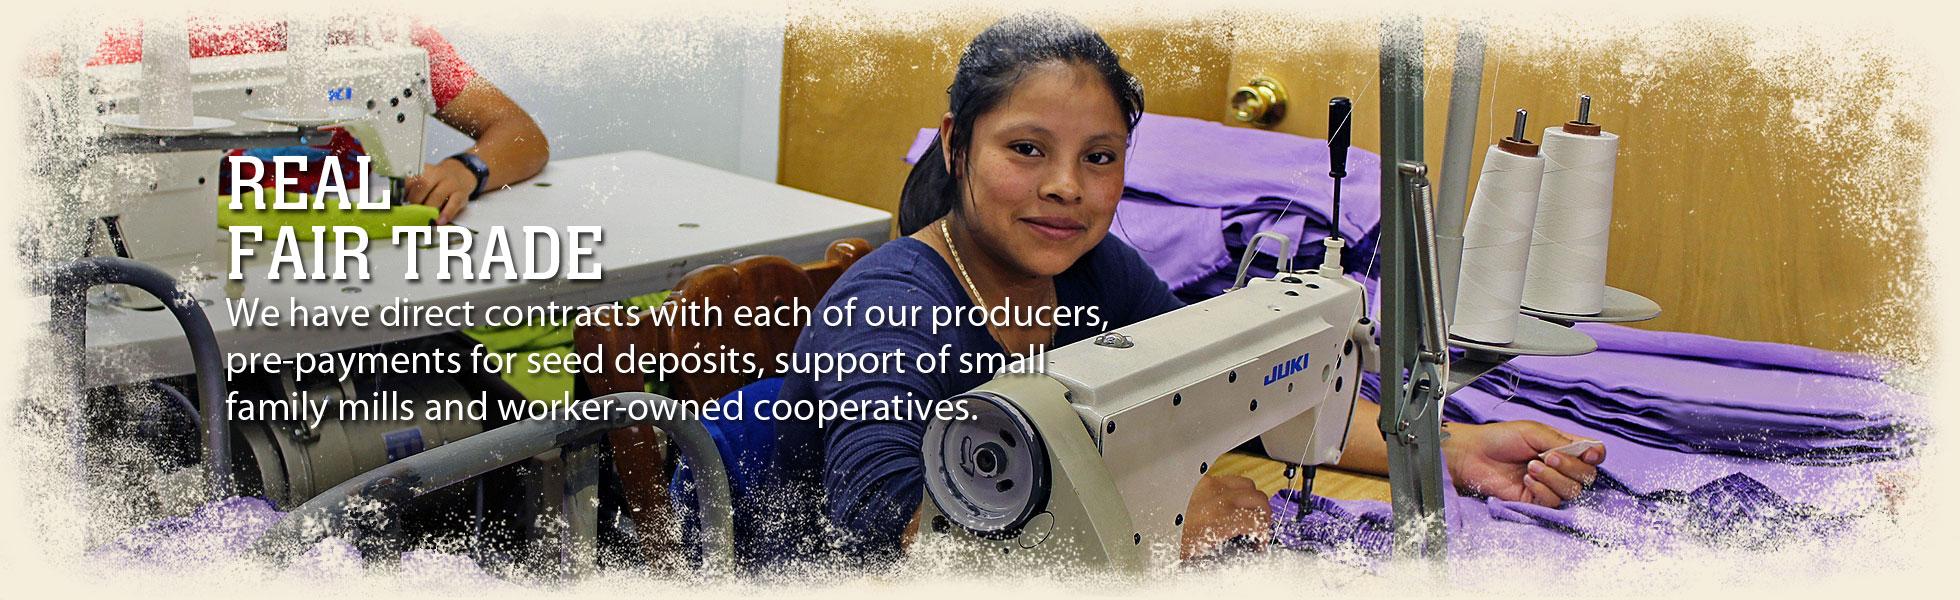 maggies-organics-fair-trade-process-2.jpg